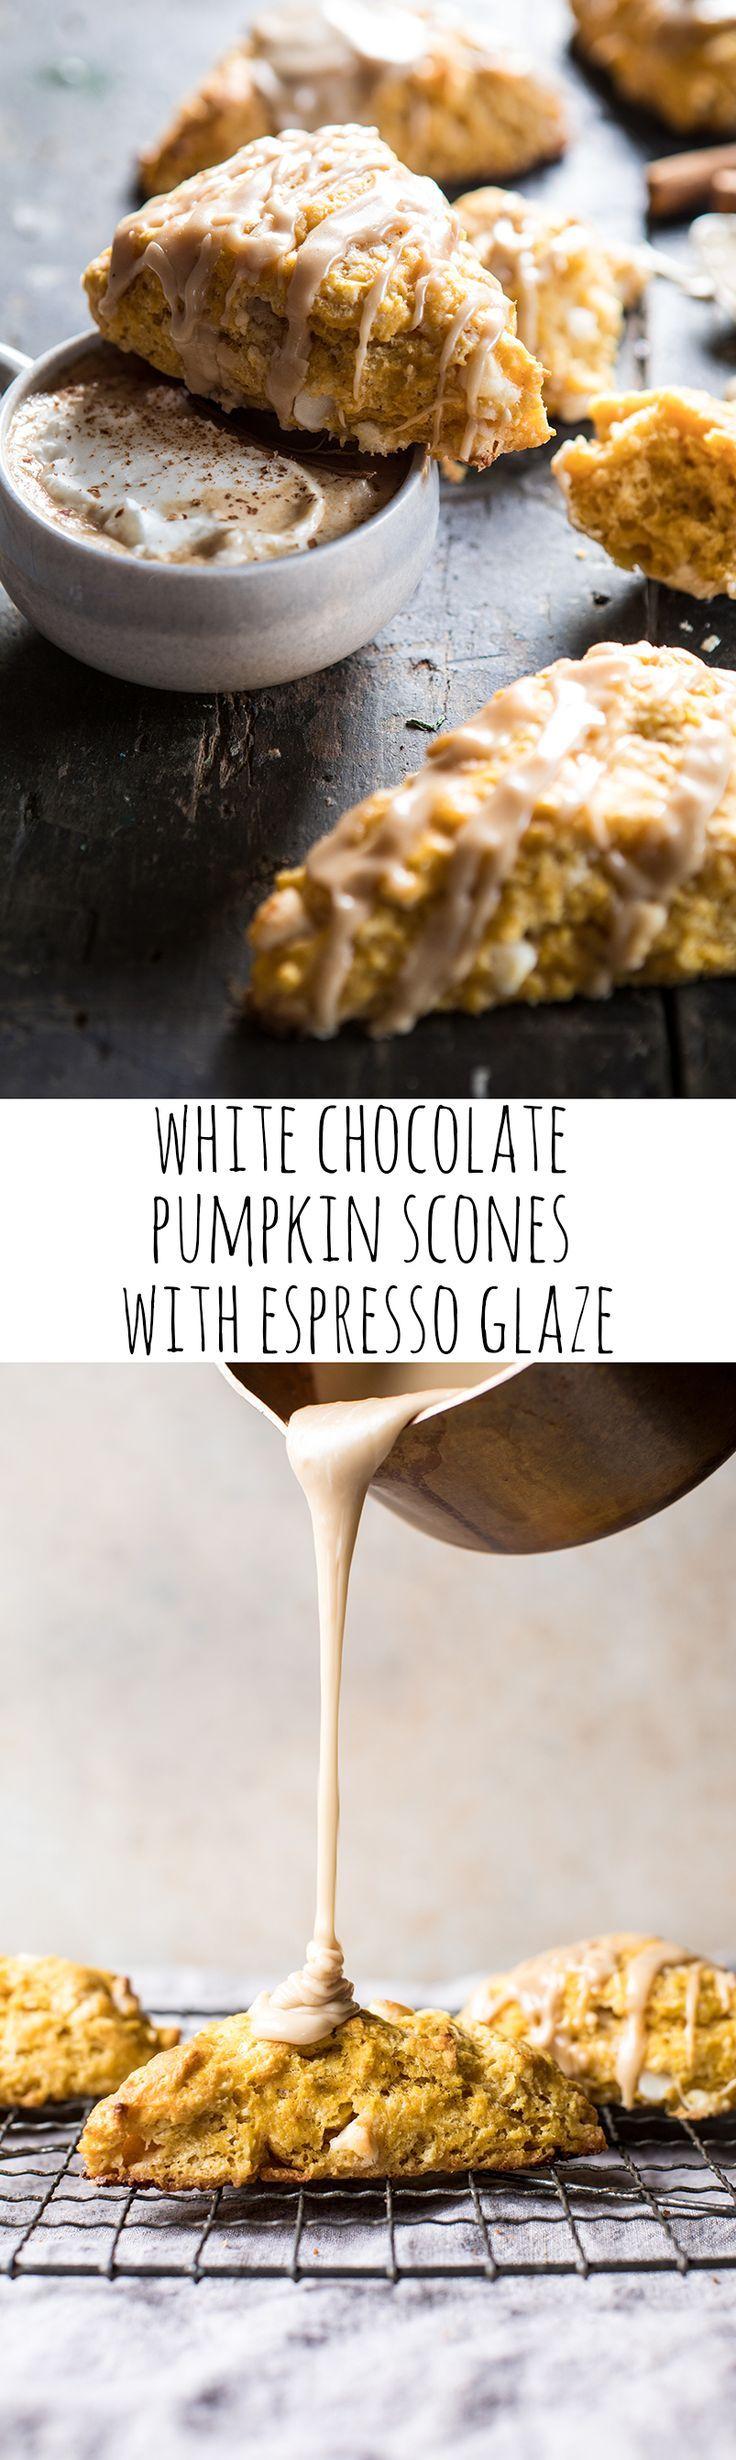 White Chocolate Pumpkin Scones with Espresso Glaze   halfbakedharvest.com @hbharvest